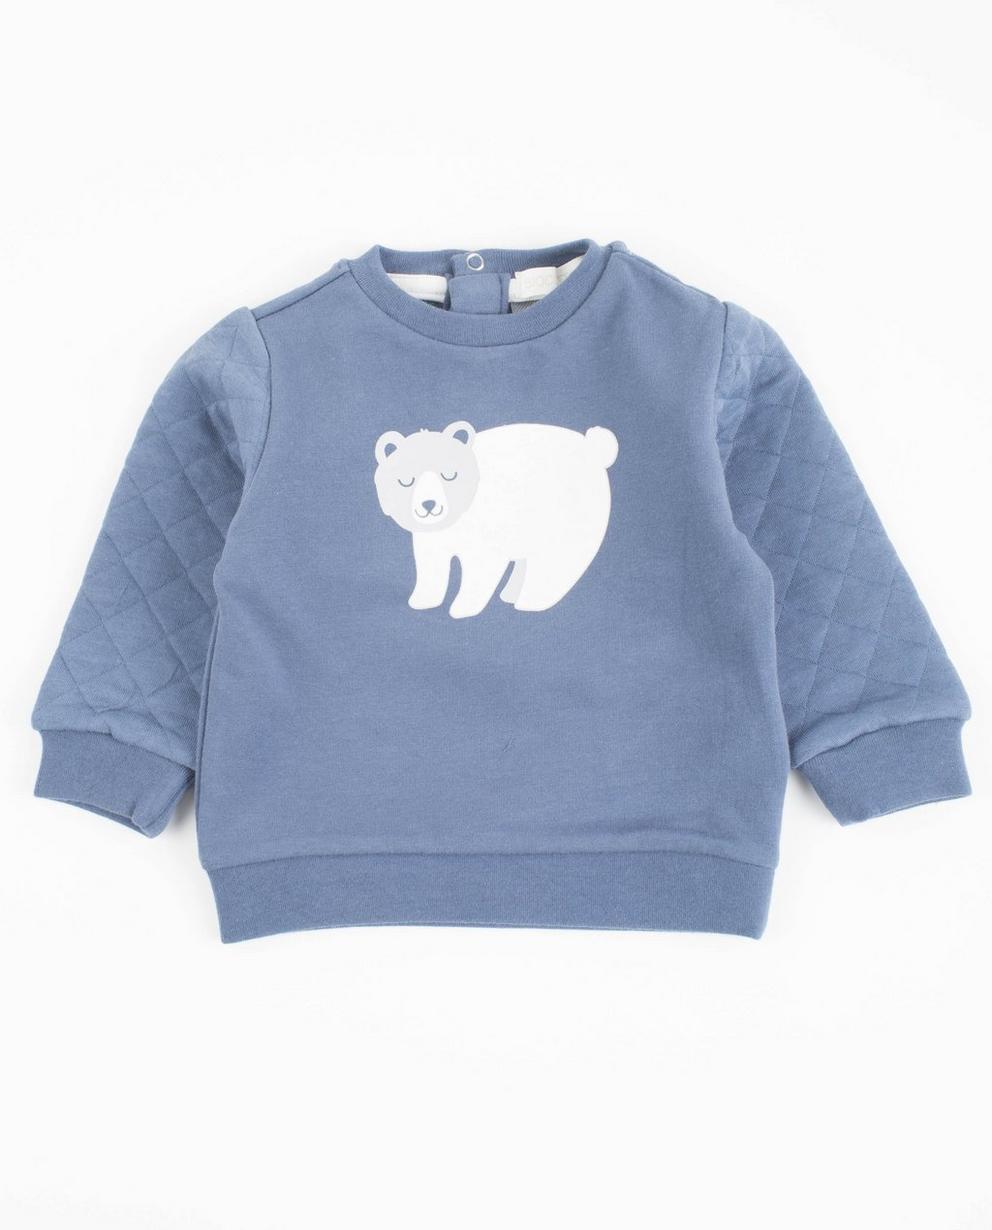 Sweat avec imprimé ours - bleu - Newborn